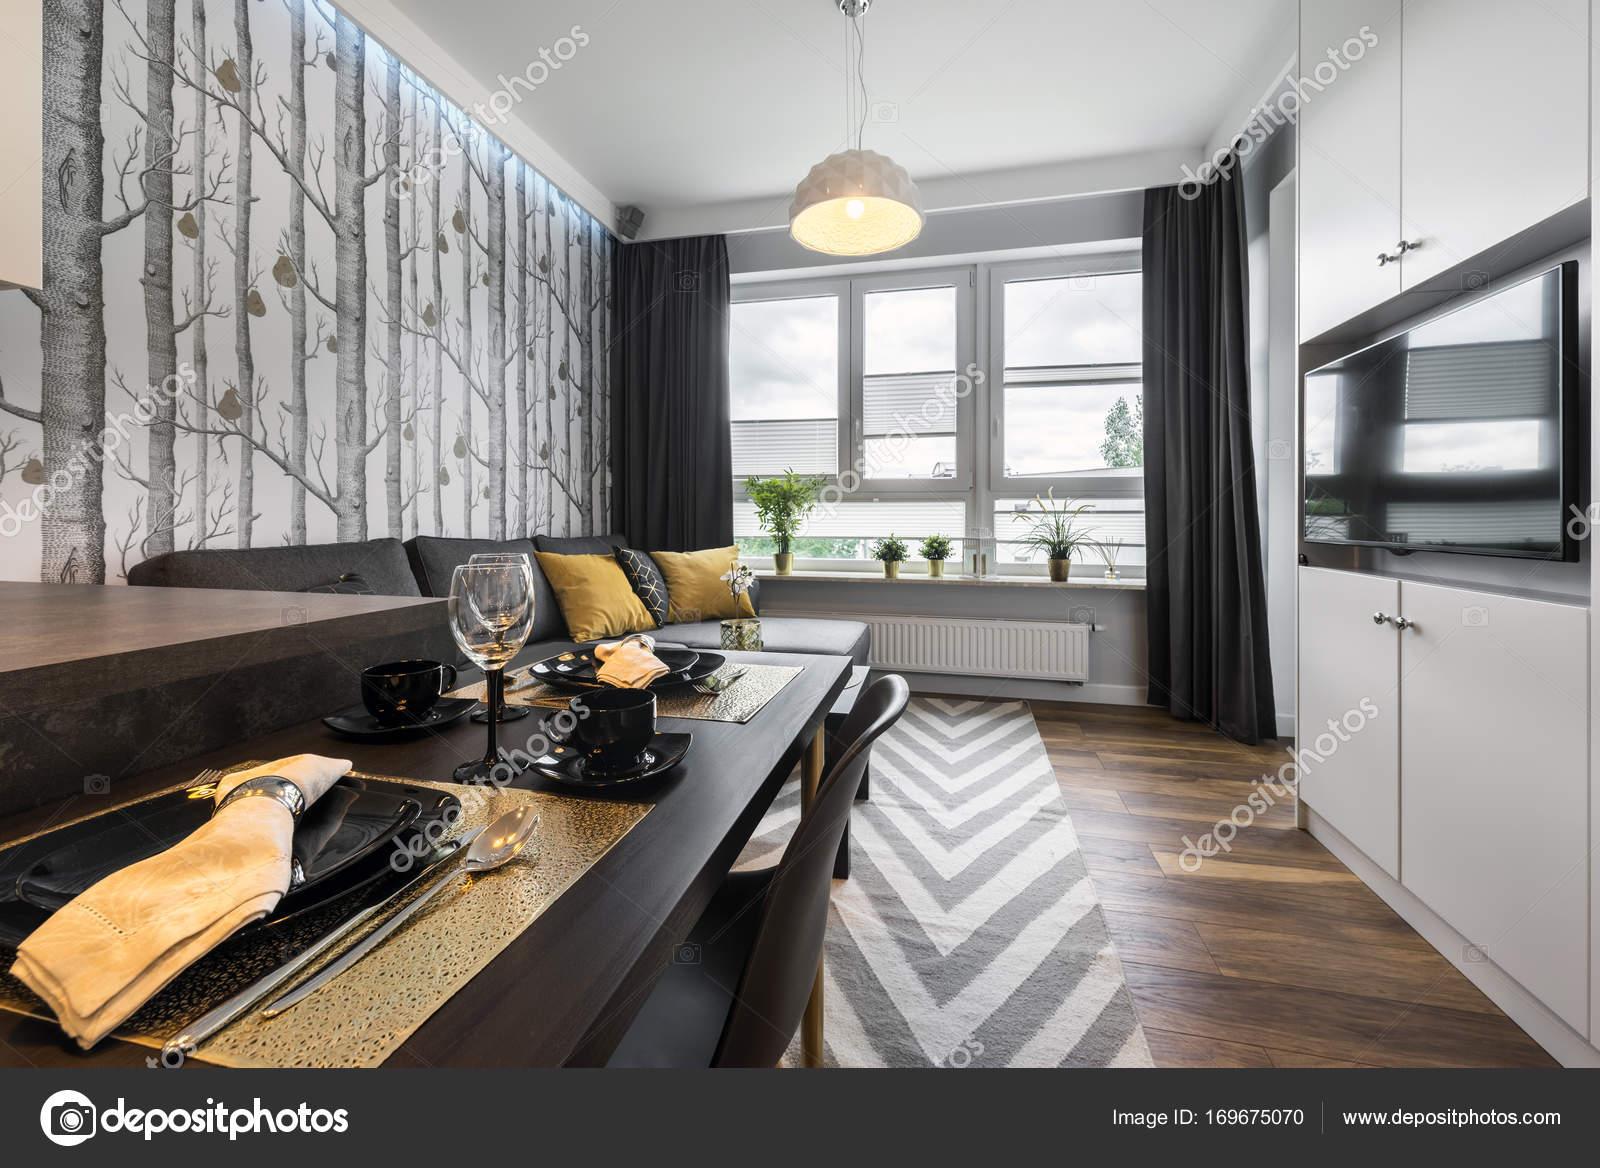 https://st3.depositphotos.com/1033308/16967/i/1600/depositphotos_169675070-stockafbeelding-modern-interieur-kleine-woonkamer.jpg